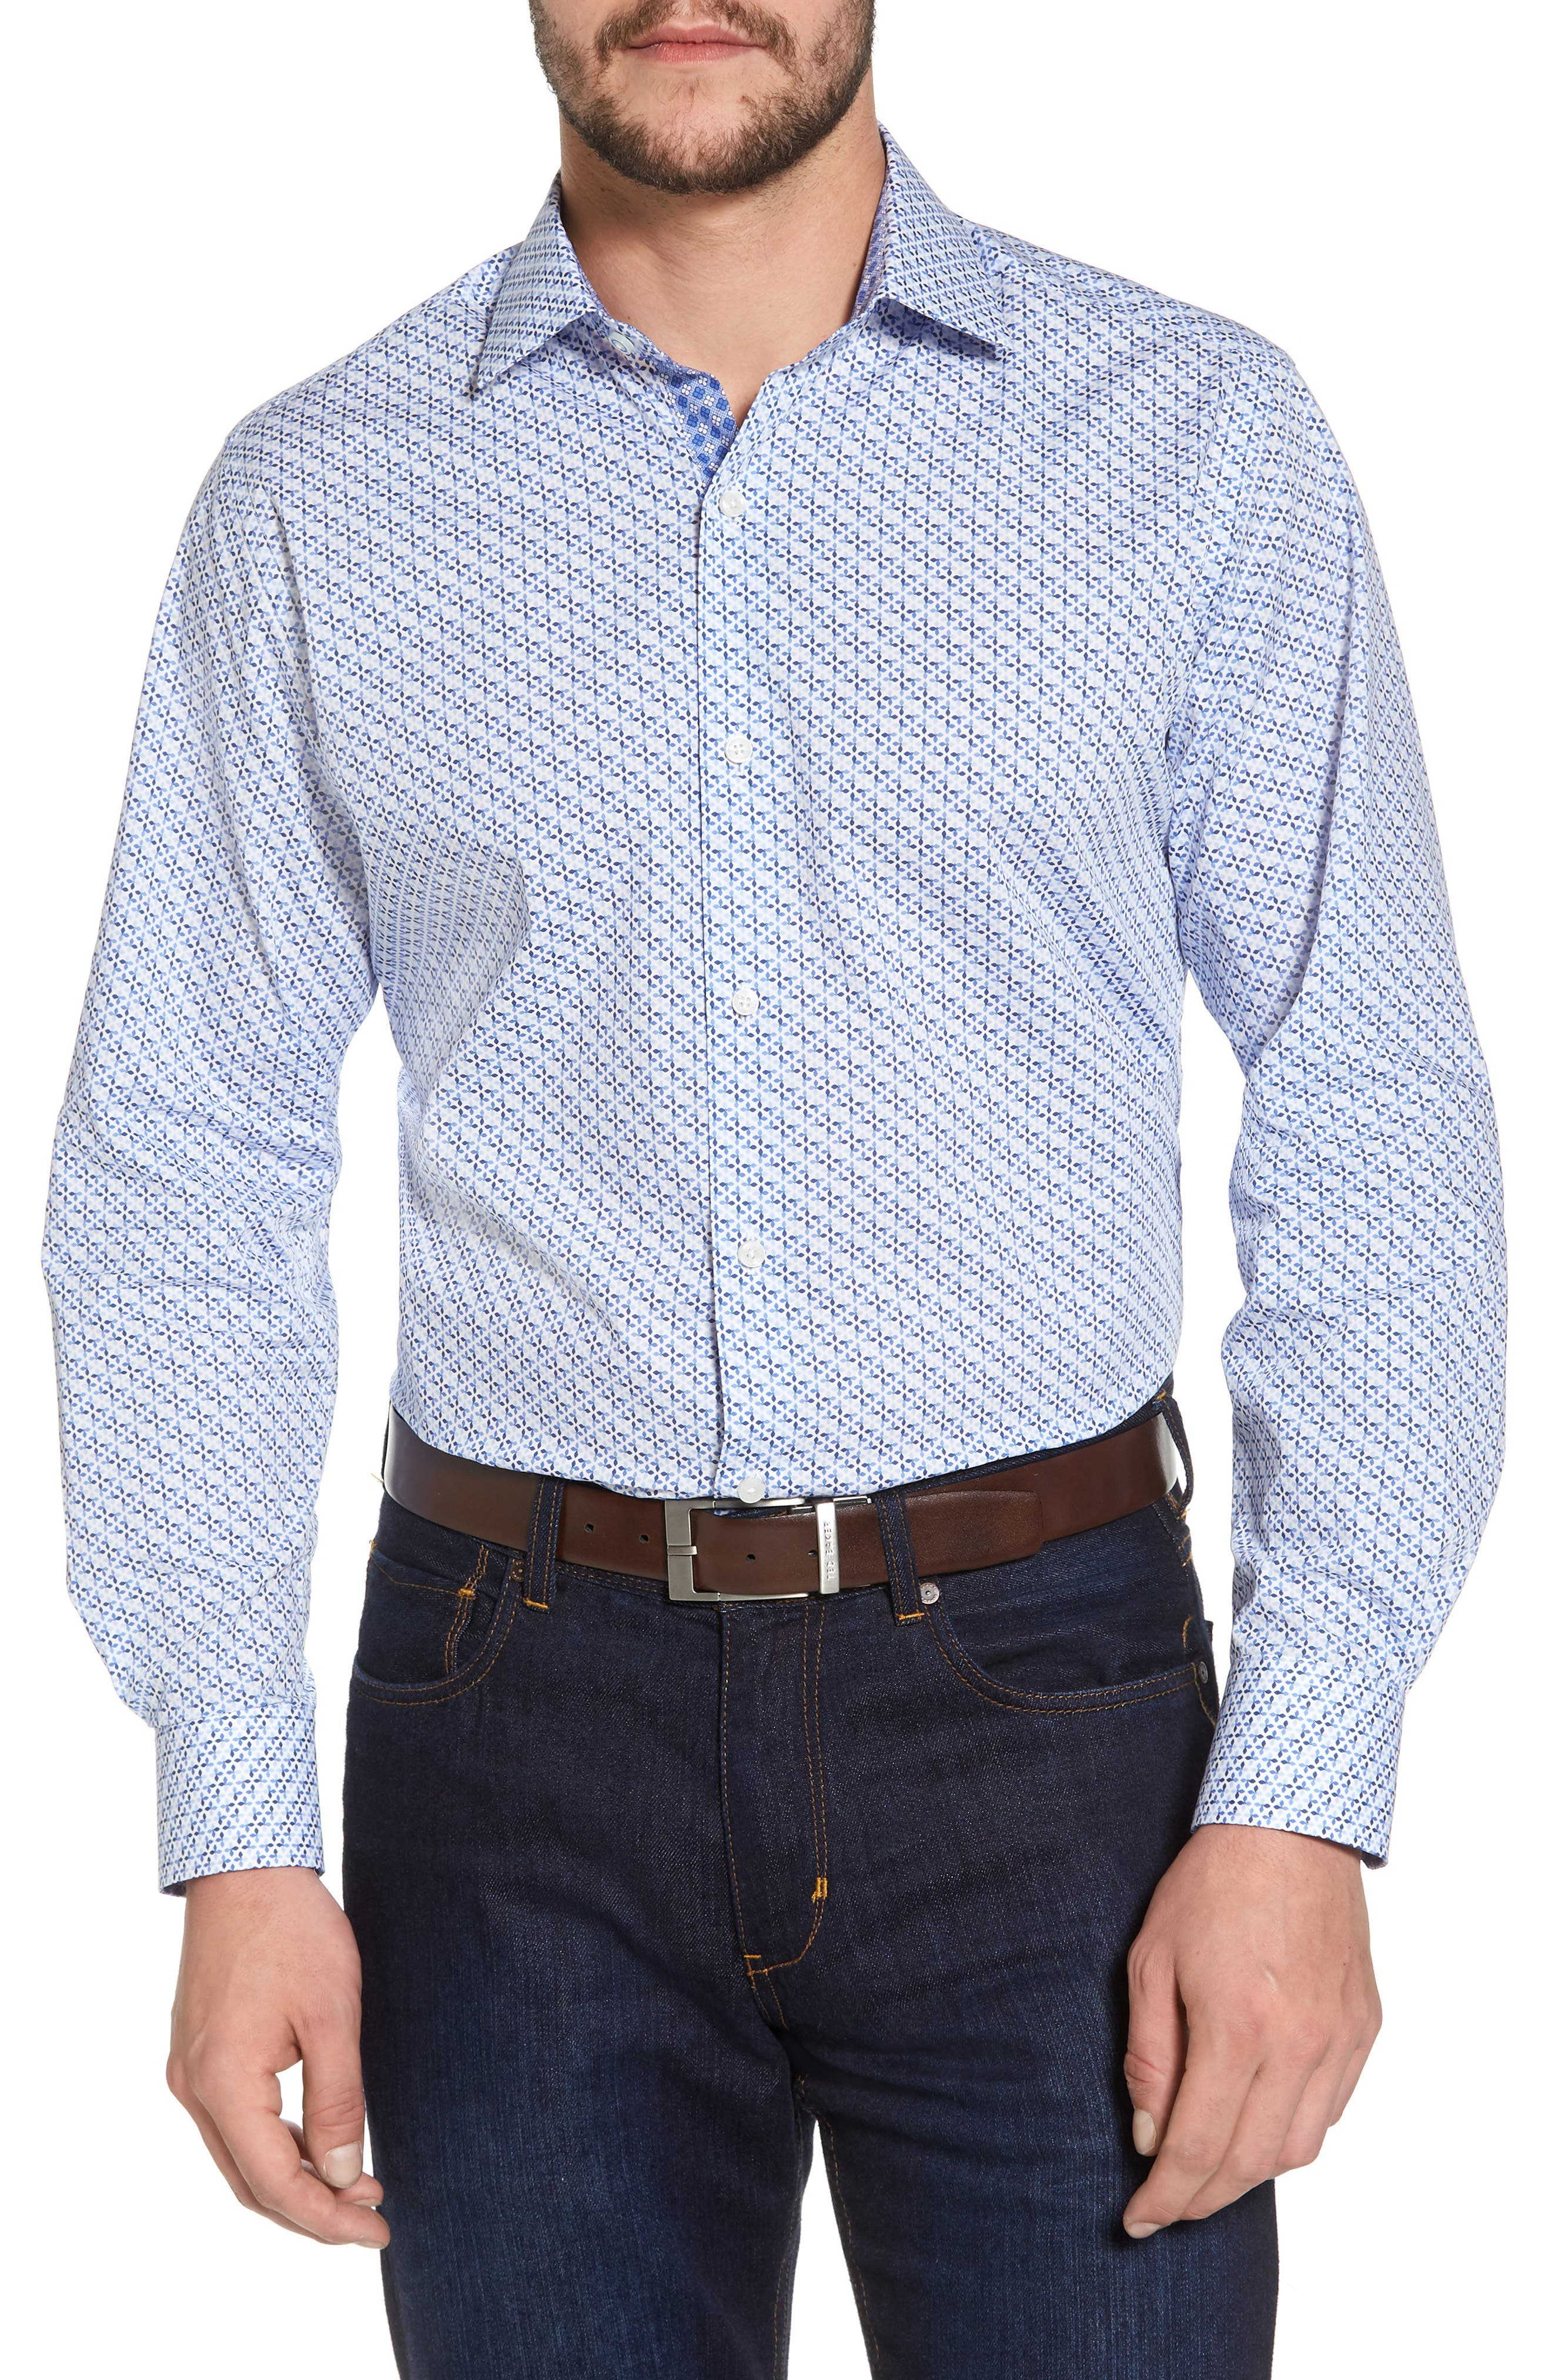 Main Image - TailorByrd Simon Regular Fit Geo Print Sport Shirt